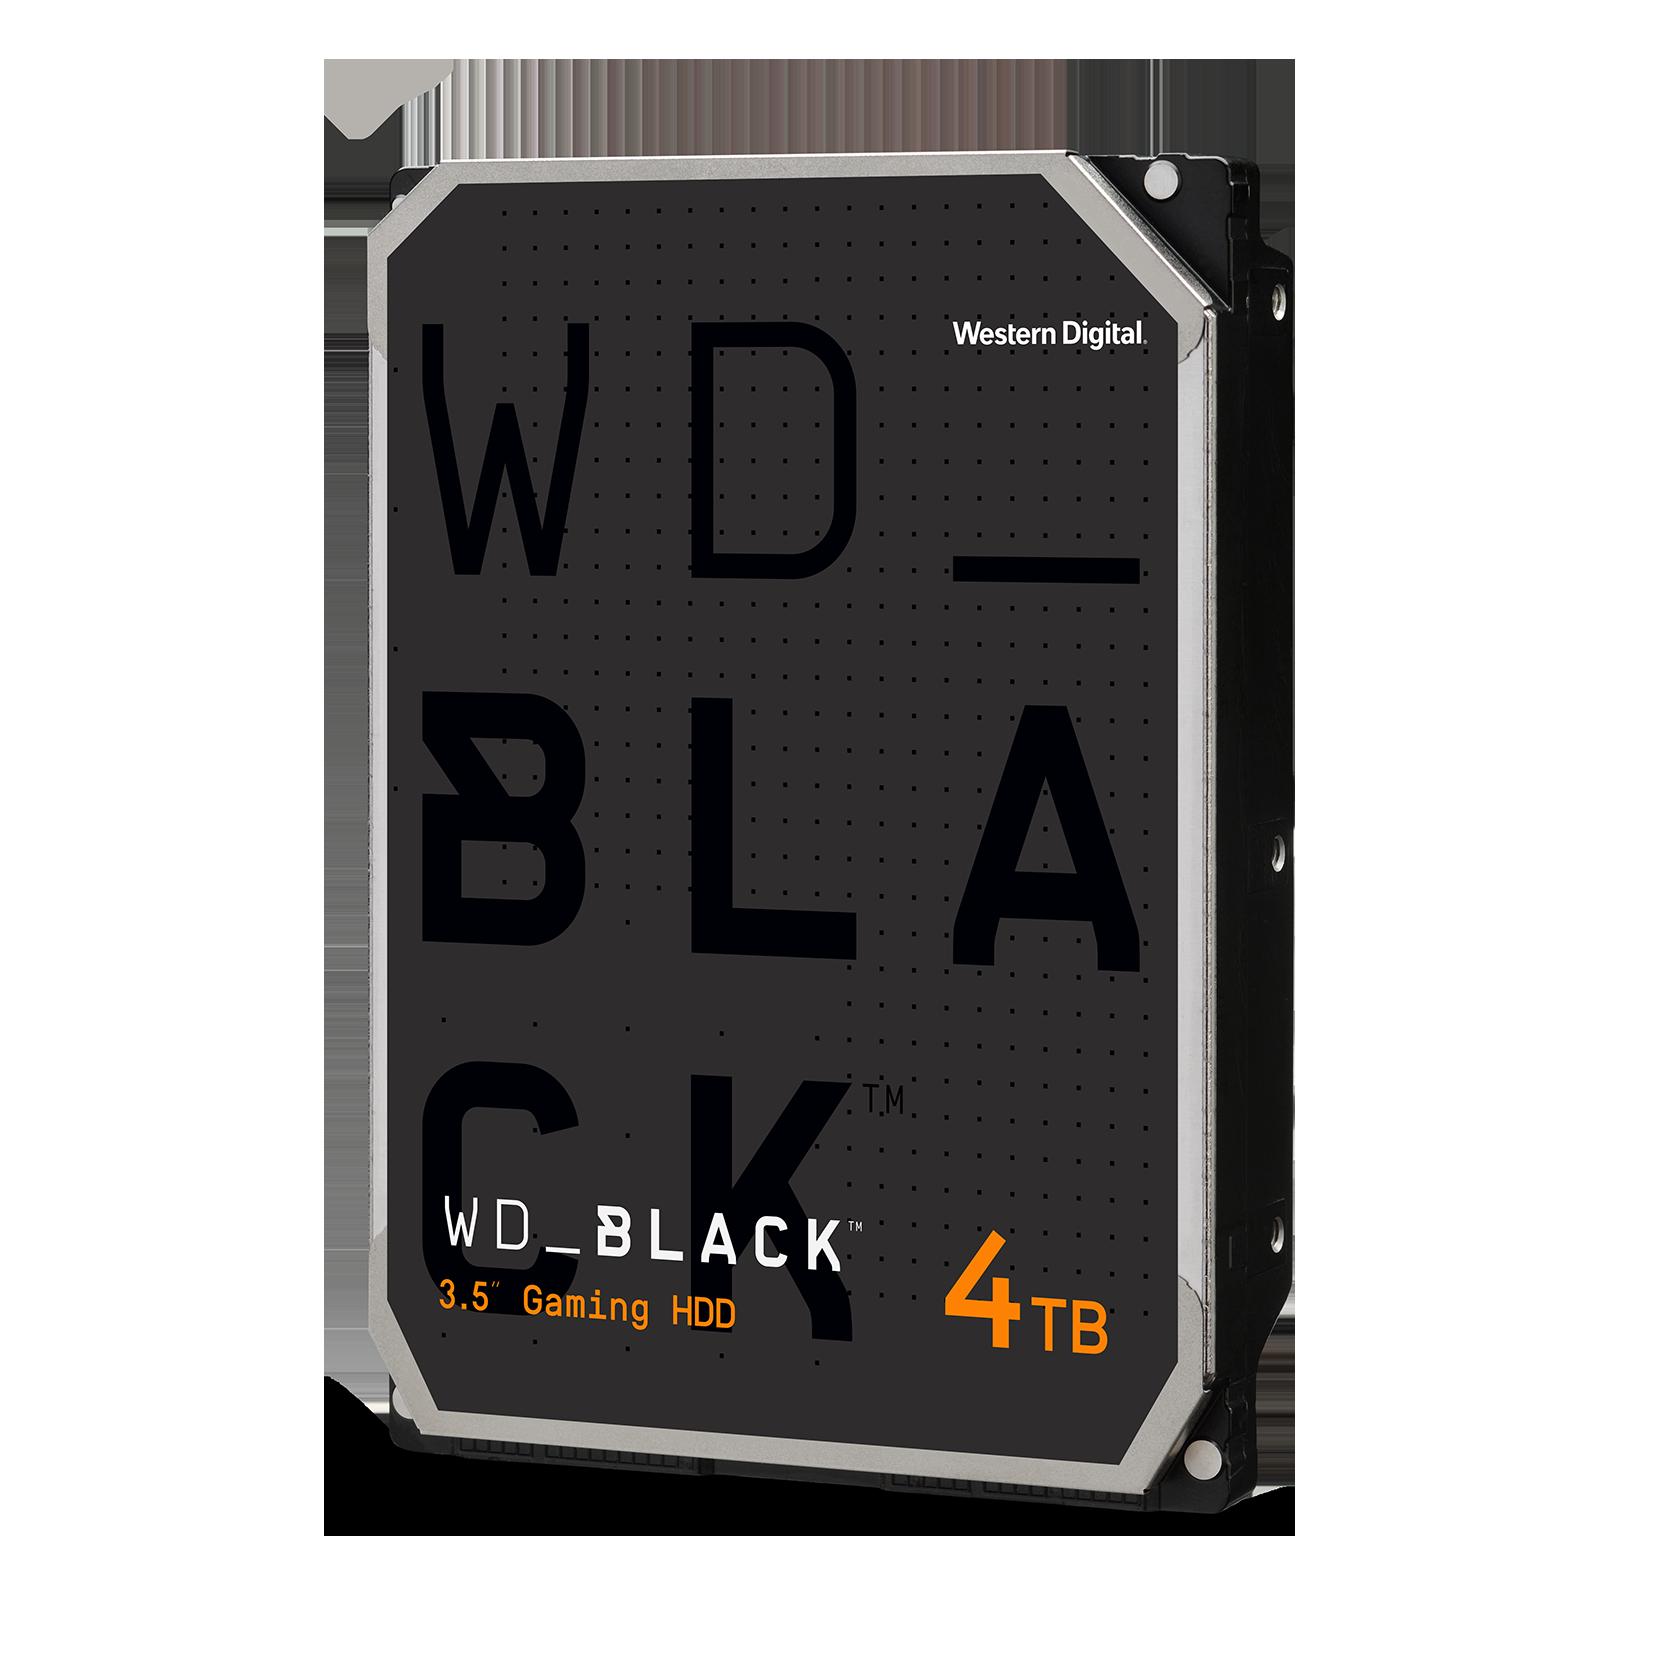 Storage (SSD/HDD)